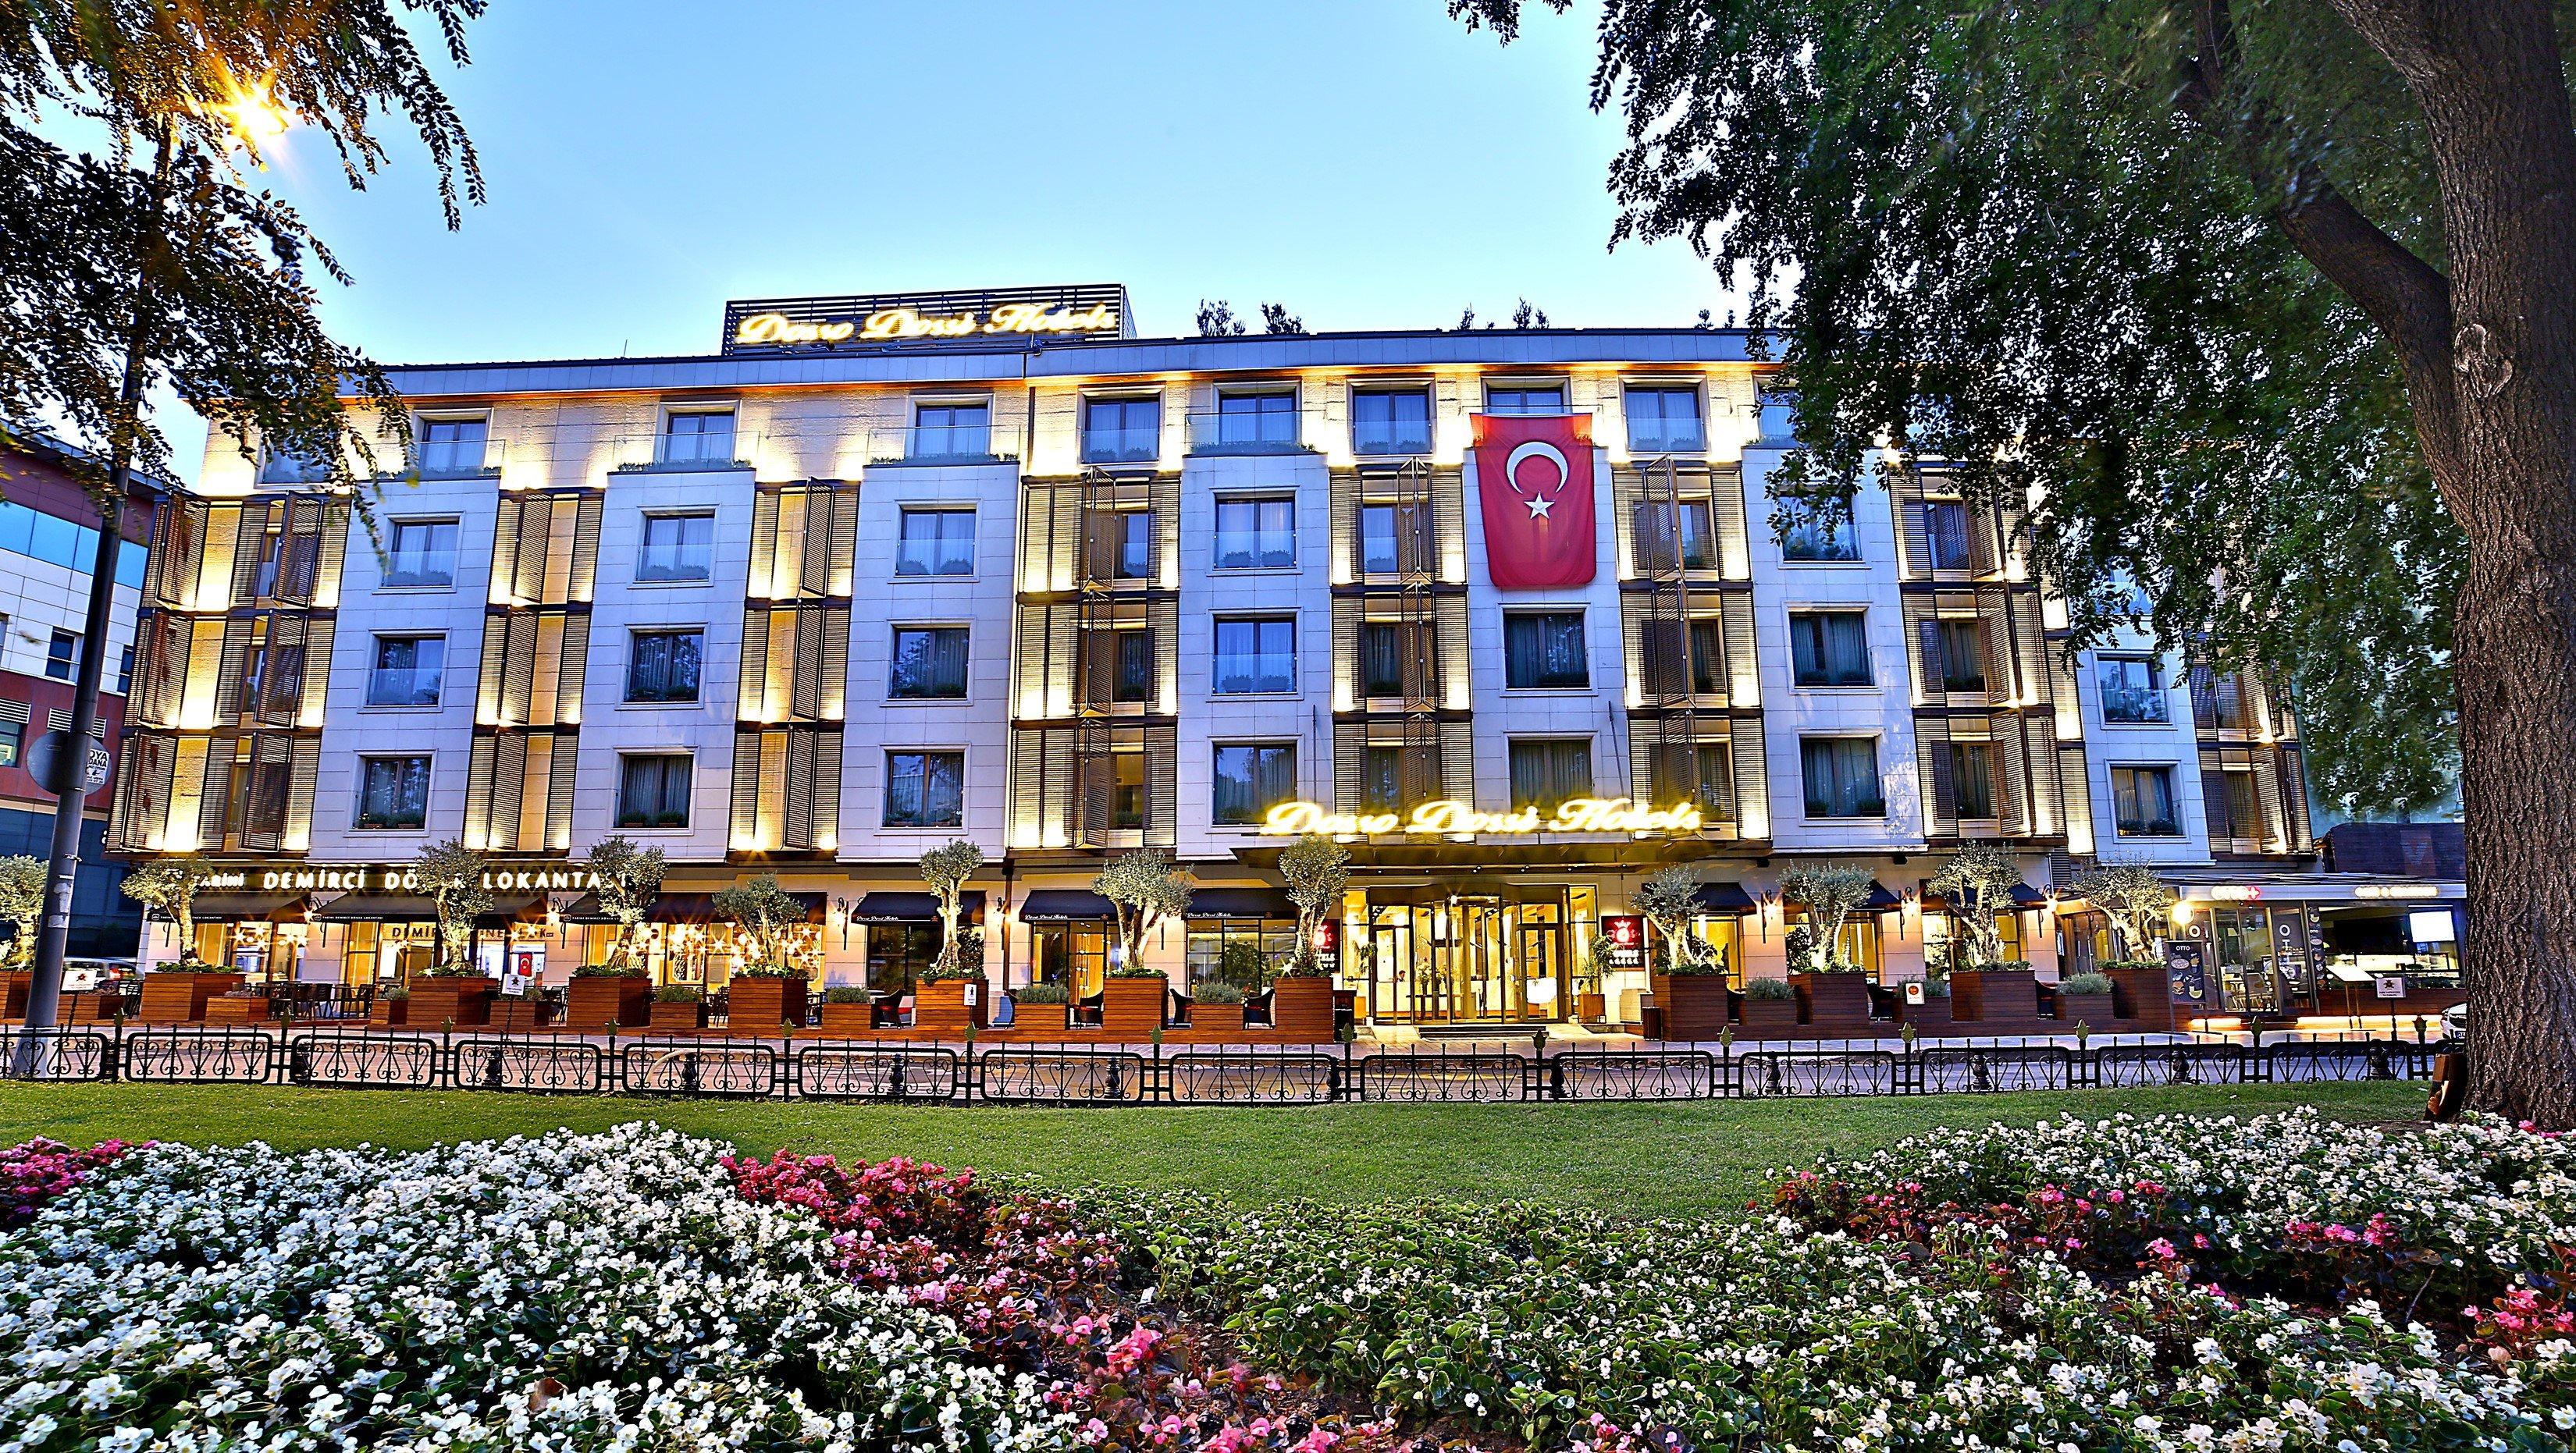 Dosso Dossi Hotels Downtown (Istanbul, Turkije) - Hotel Beoordelingen ...: www.tripadvisor.nl/Hotel_Review-g293974-d7898972-Reviews-Dosso...